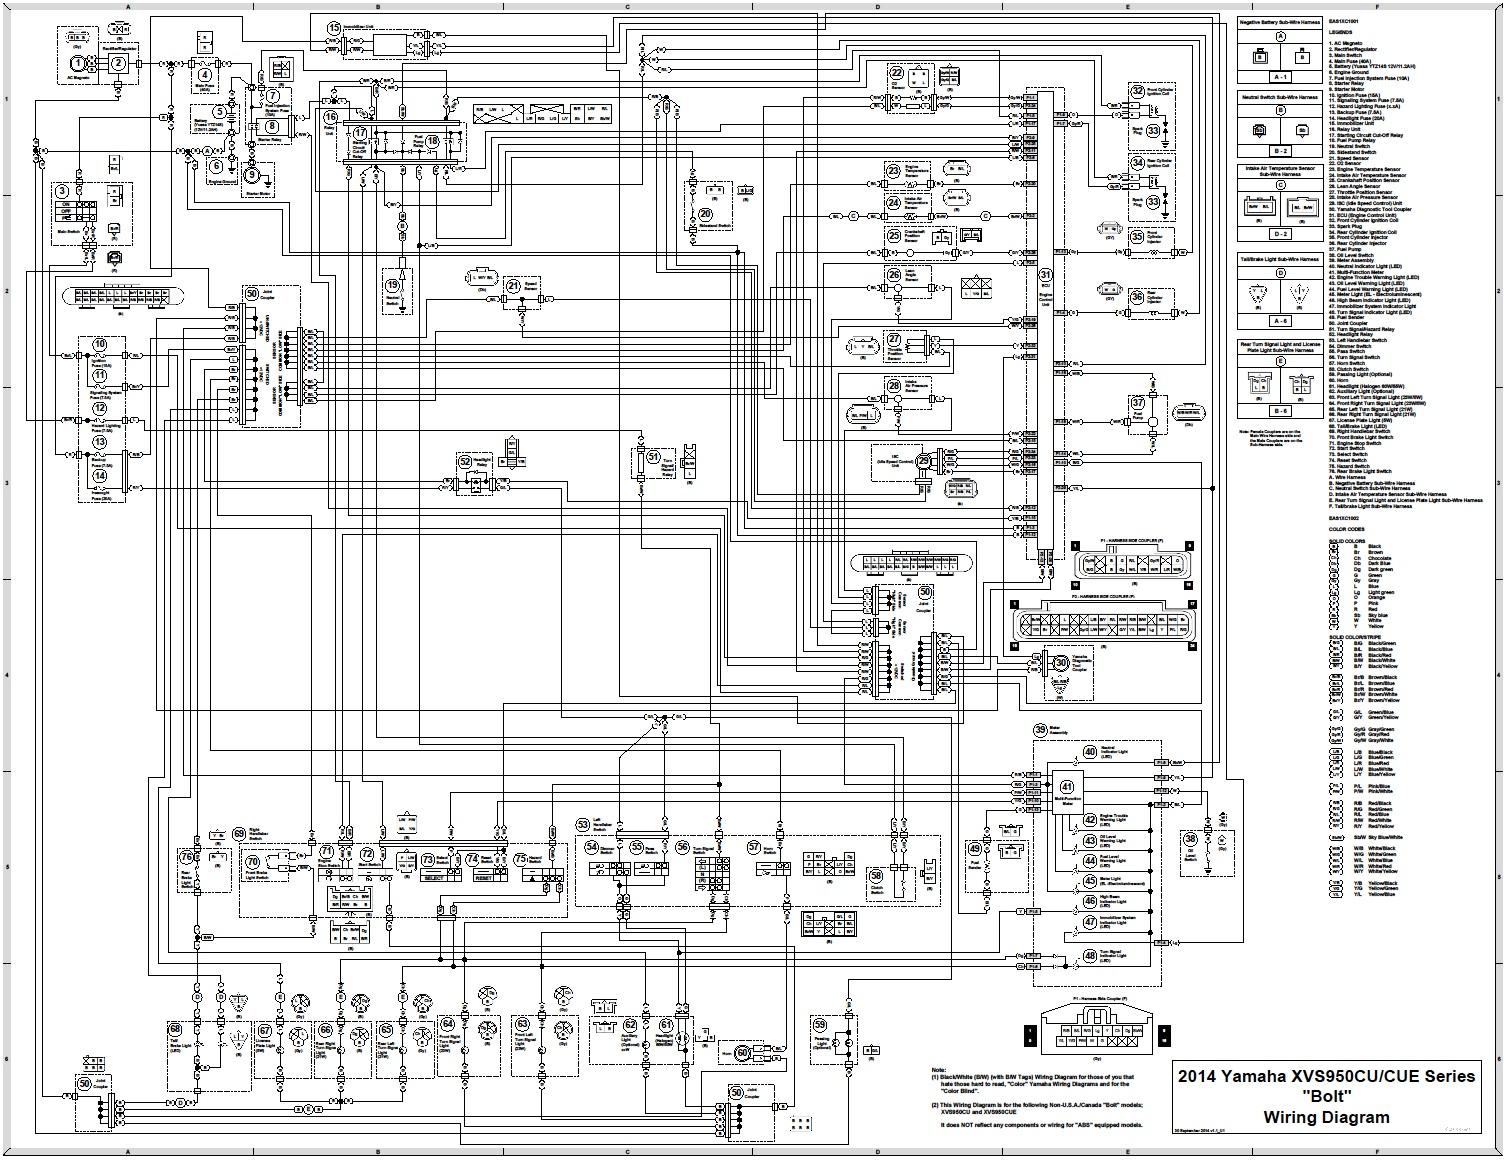 1982 Yamaha 750 Virago Wiring Diagram In Addition 1982 Yamaha Virago